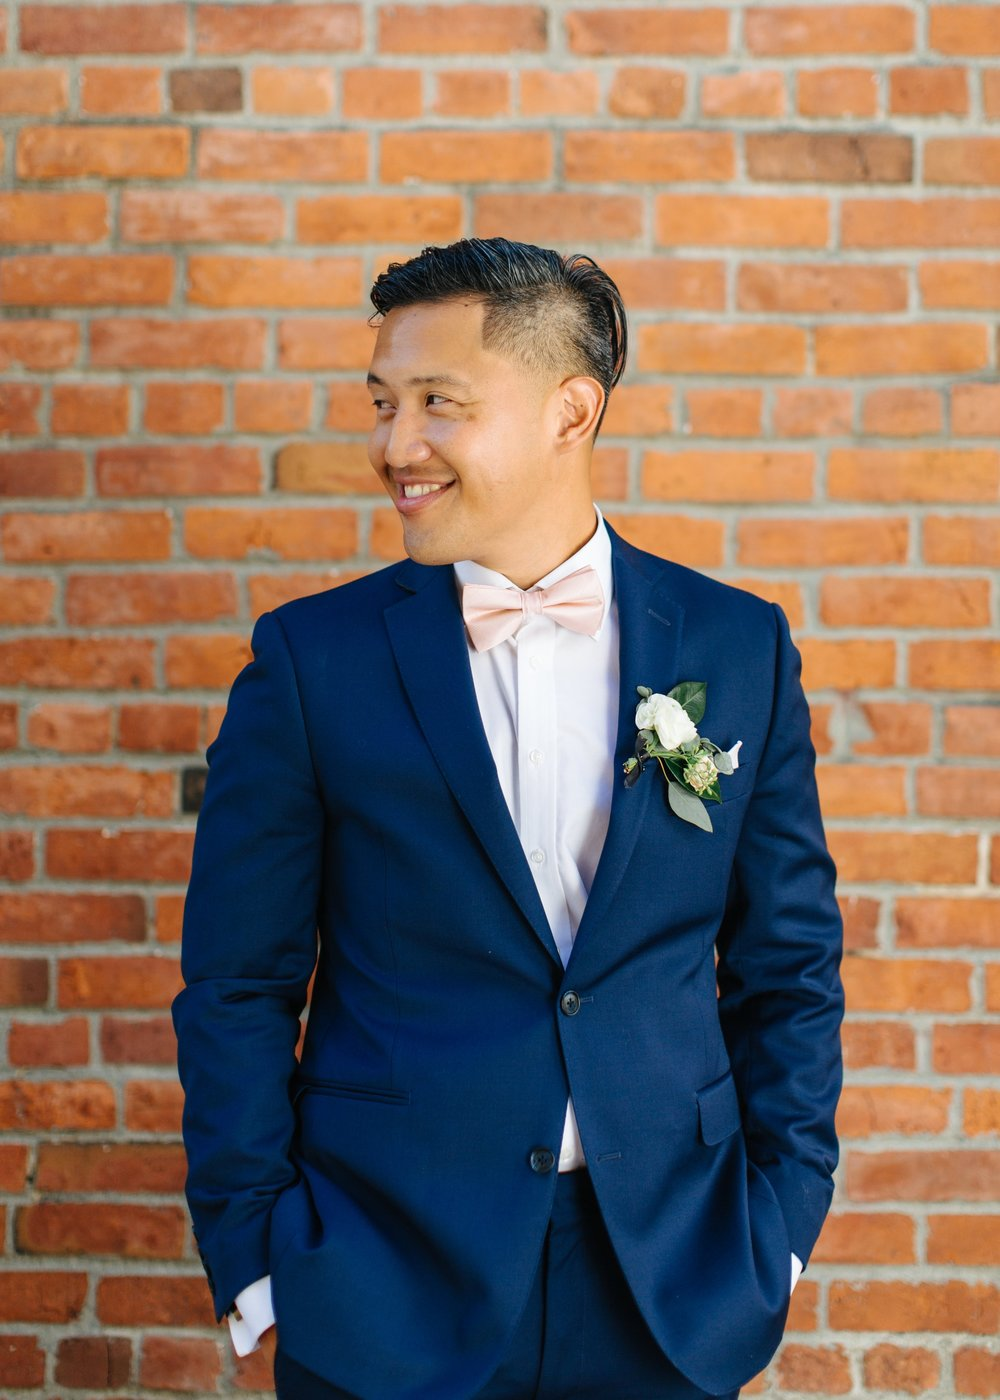 herastudios_wedding_kristina_kyle_hera_selects-65.jpg